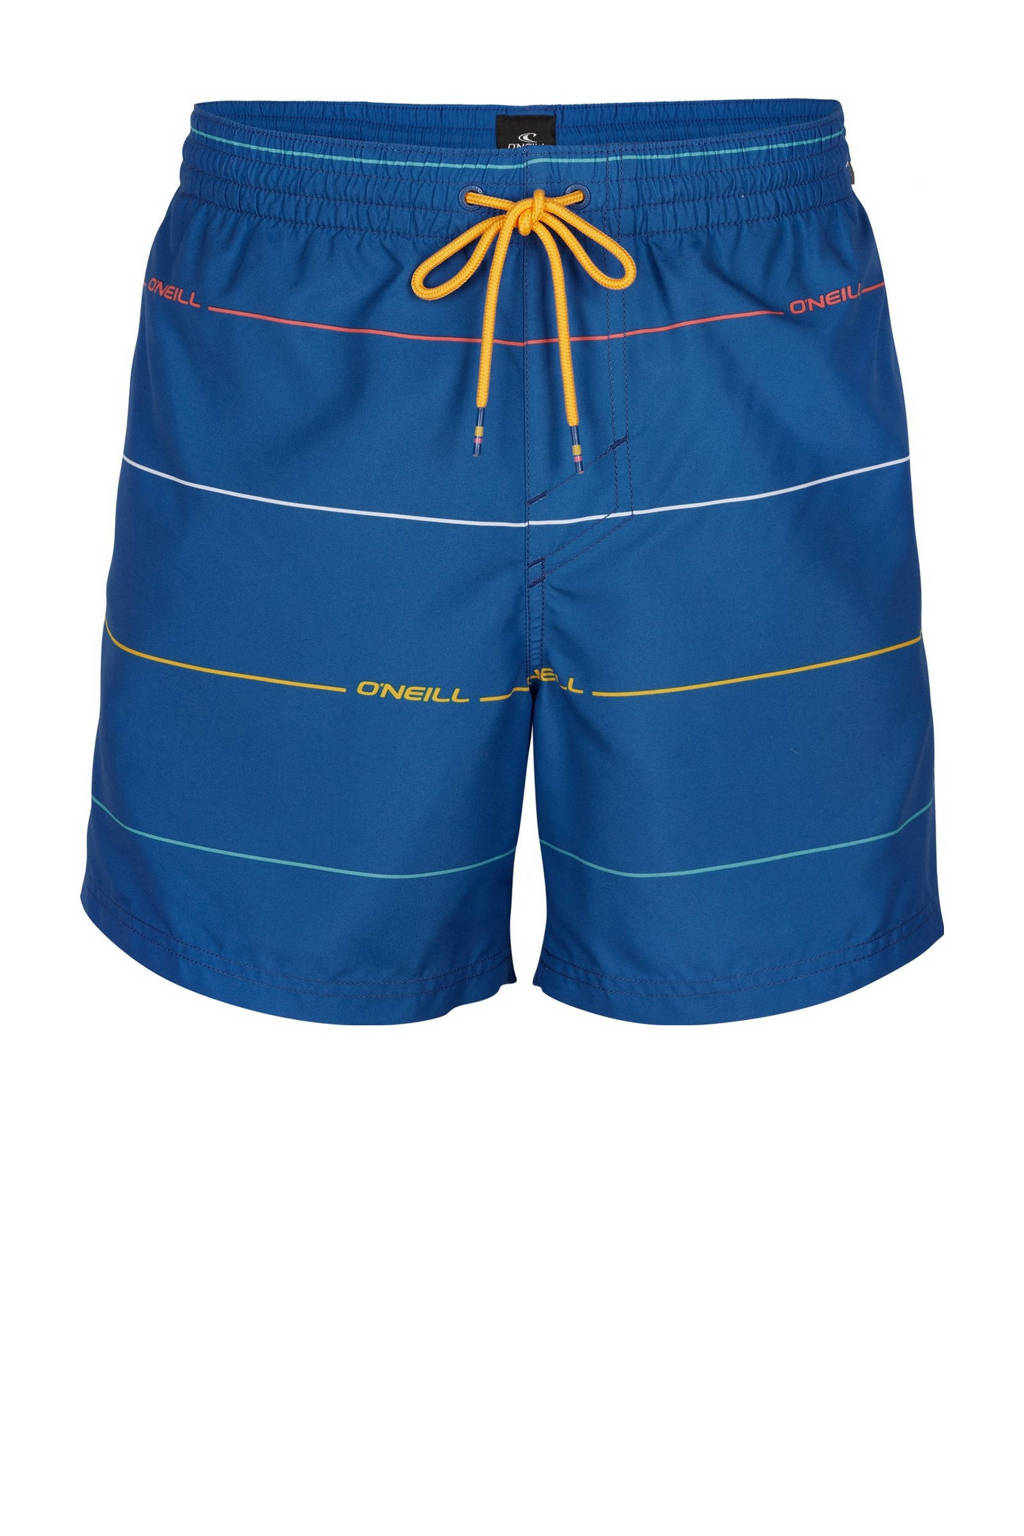 O'Neill Blue zwemshort Contourz met strepen blauw, Blauw